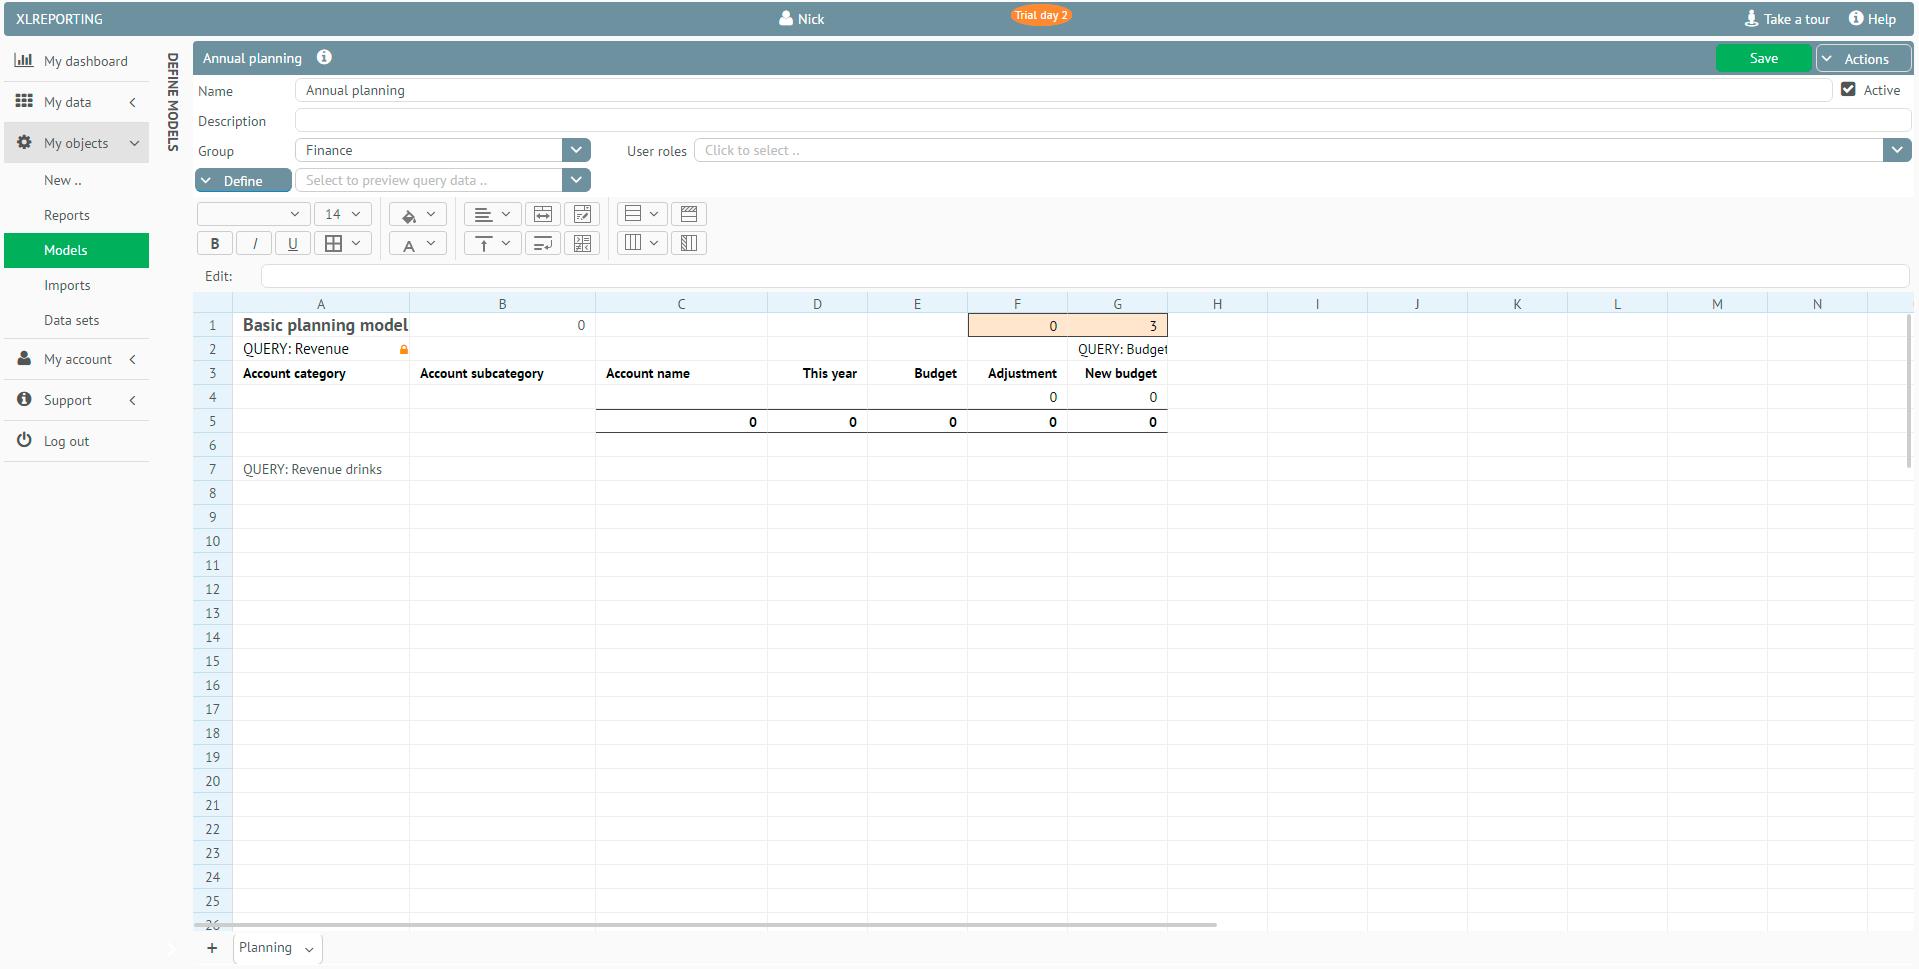 Vue Spreadsheet Regarding Creating An Online Spreadsheet Application  Dzone Web Dev